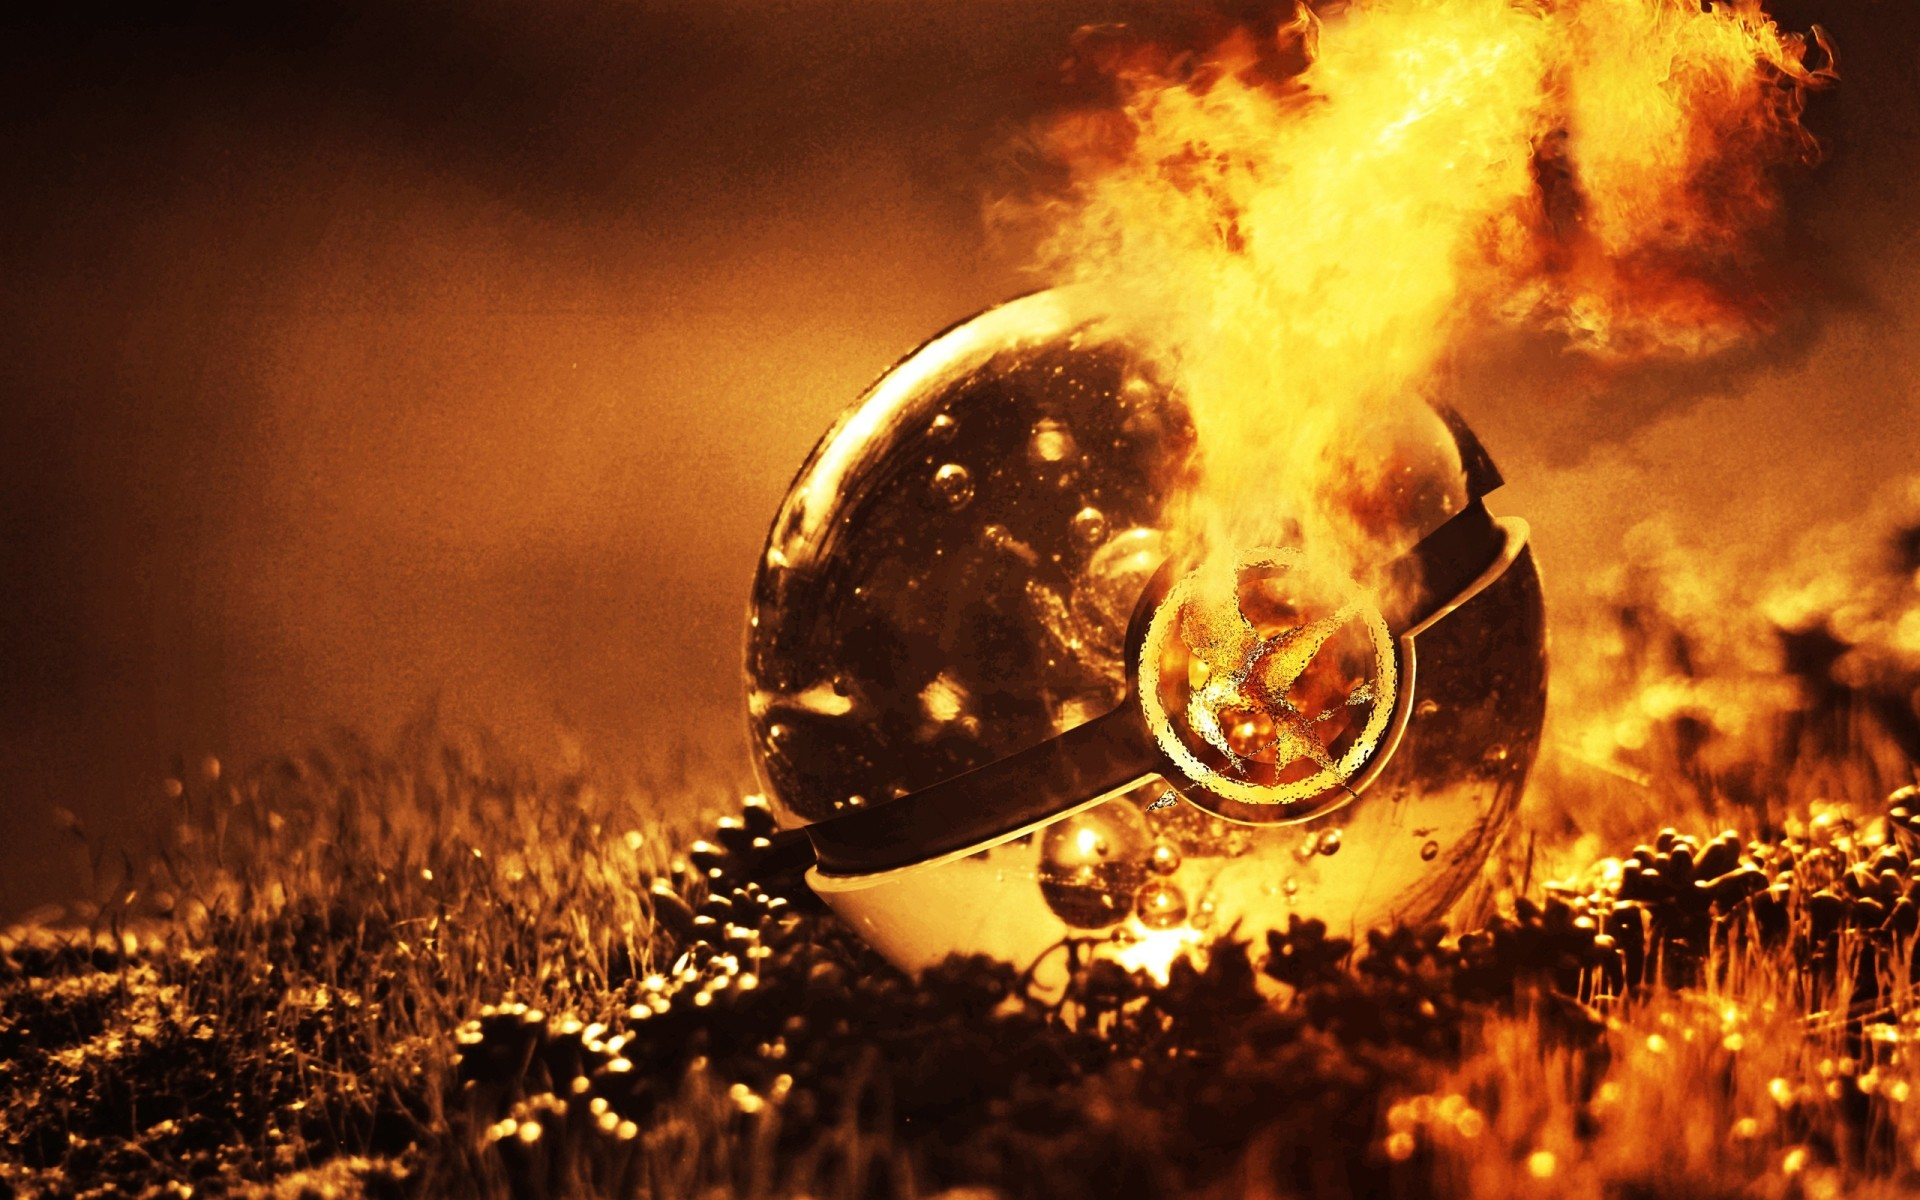 Imaginative The Hunger Games Pokeball Wallpaper